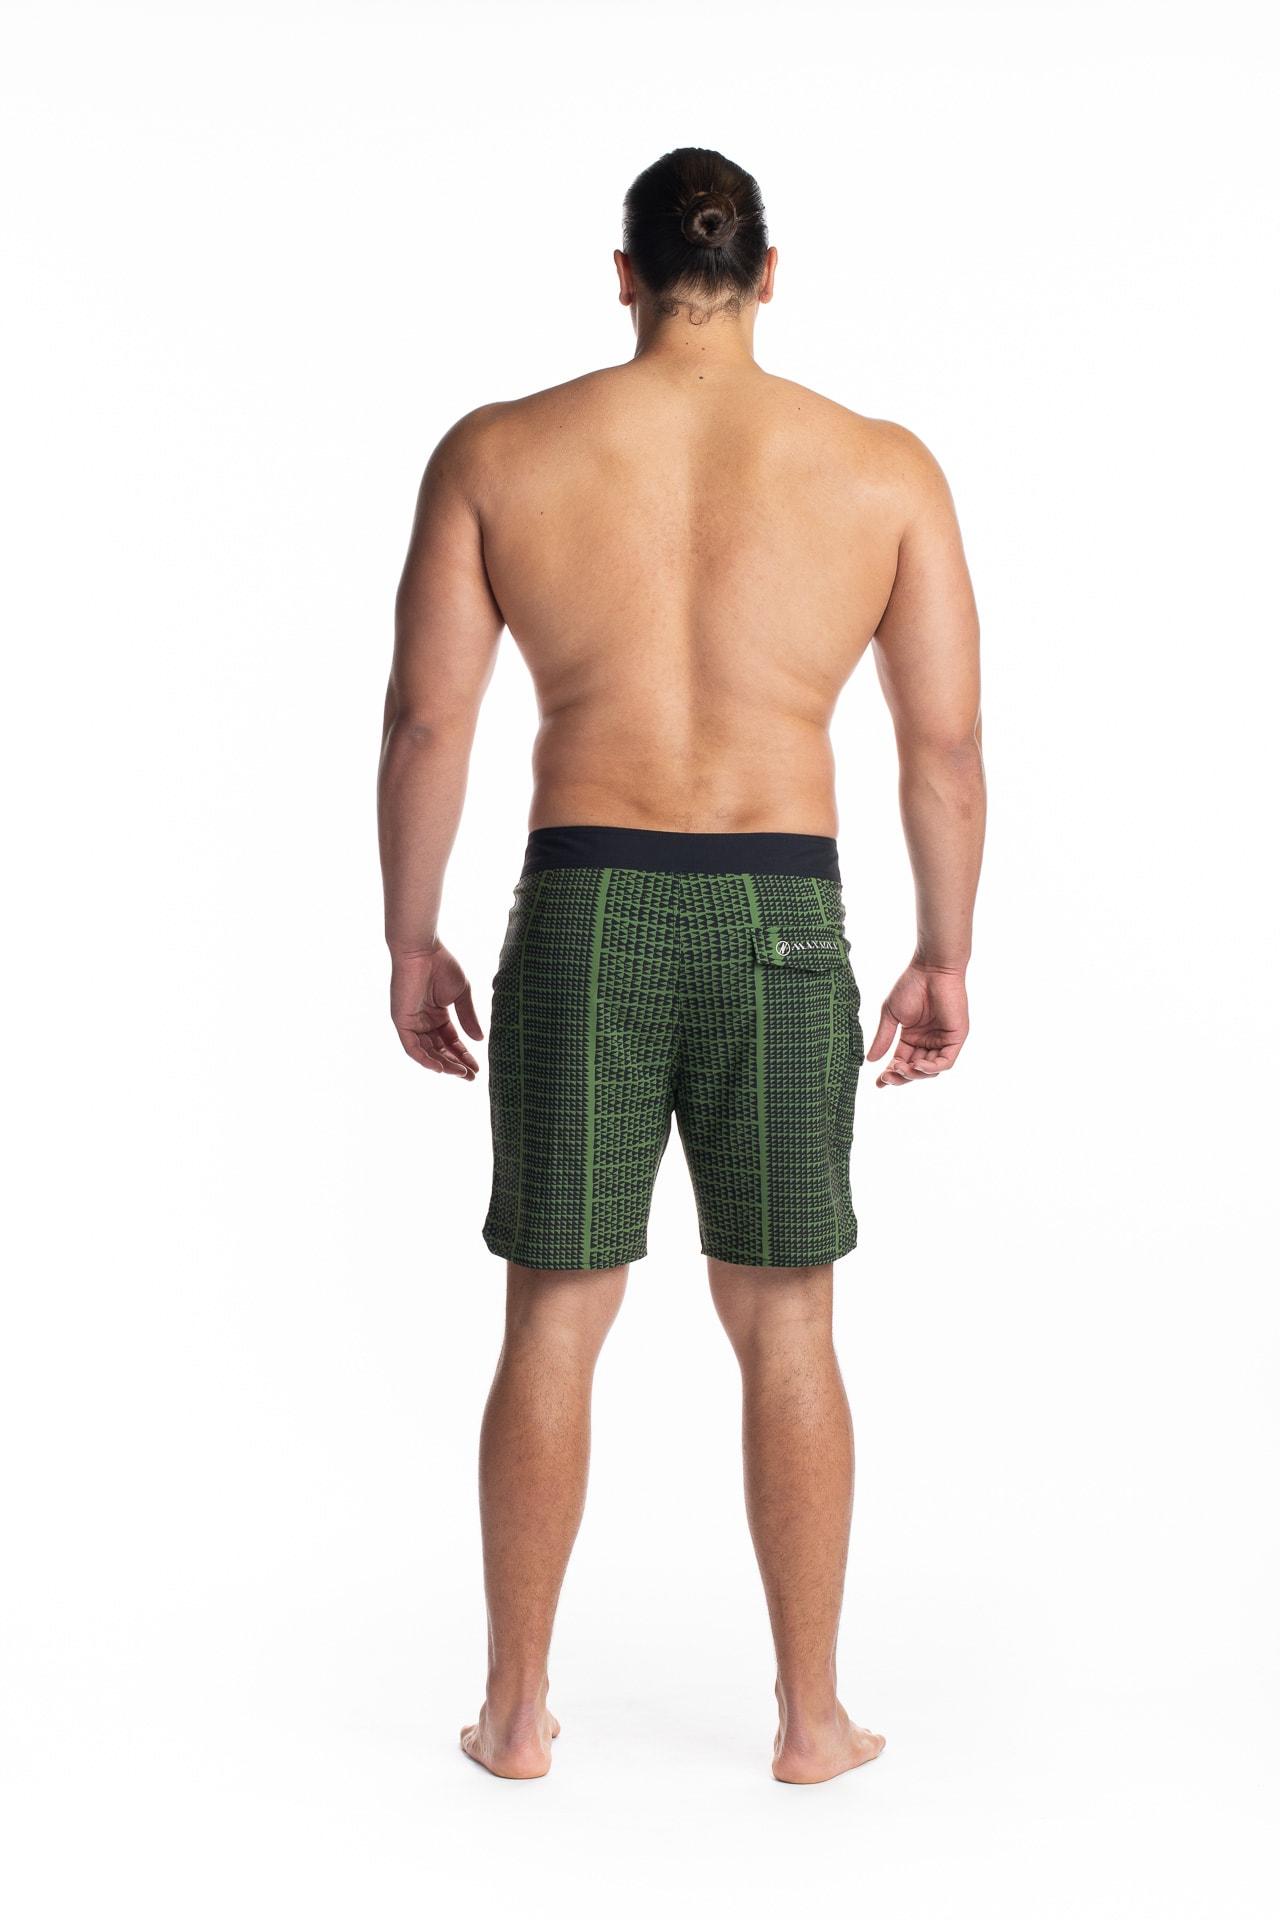 Male model wearing 4-way Stretch in Green Black Niho Ku - Back View